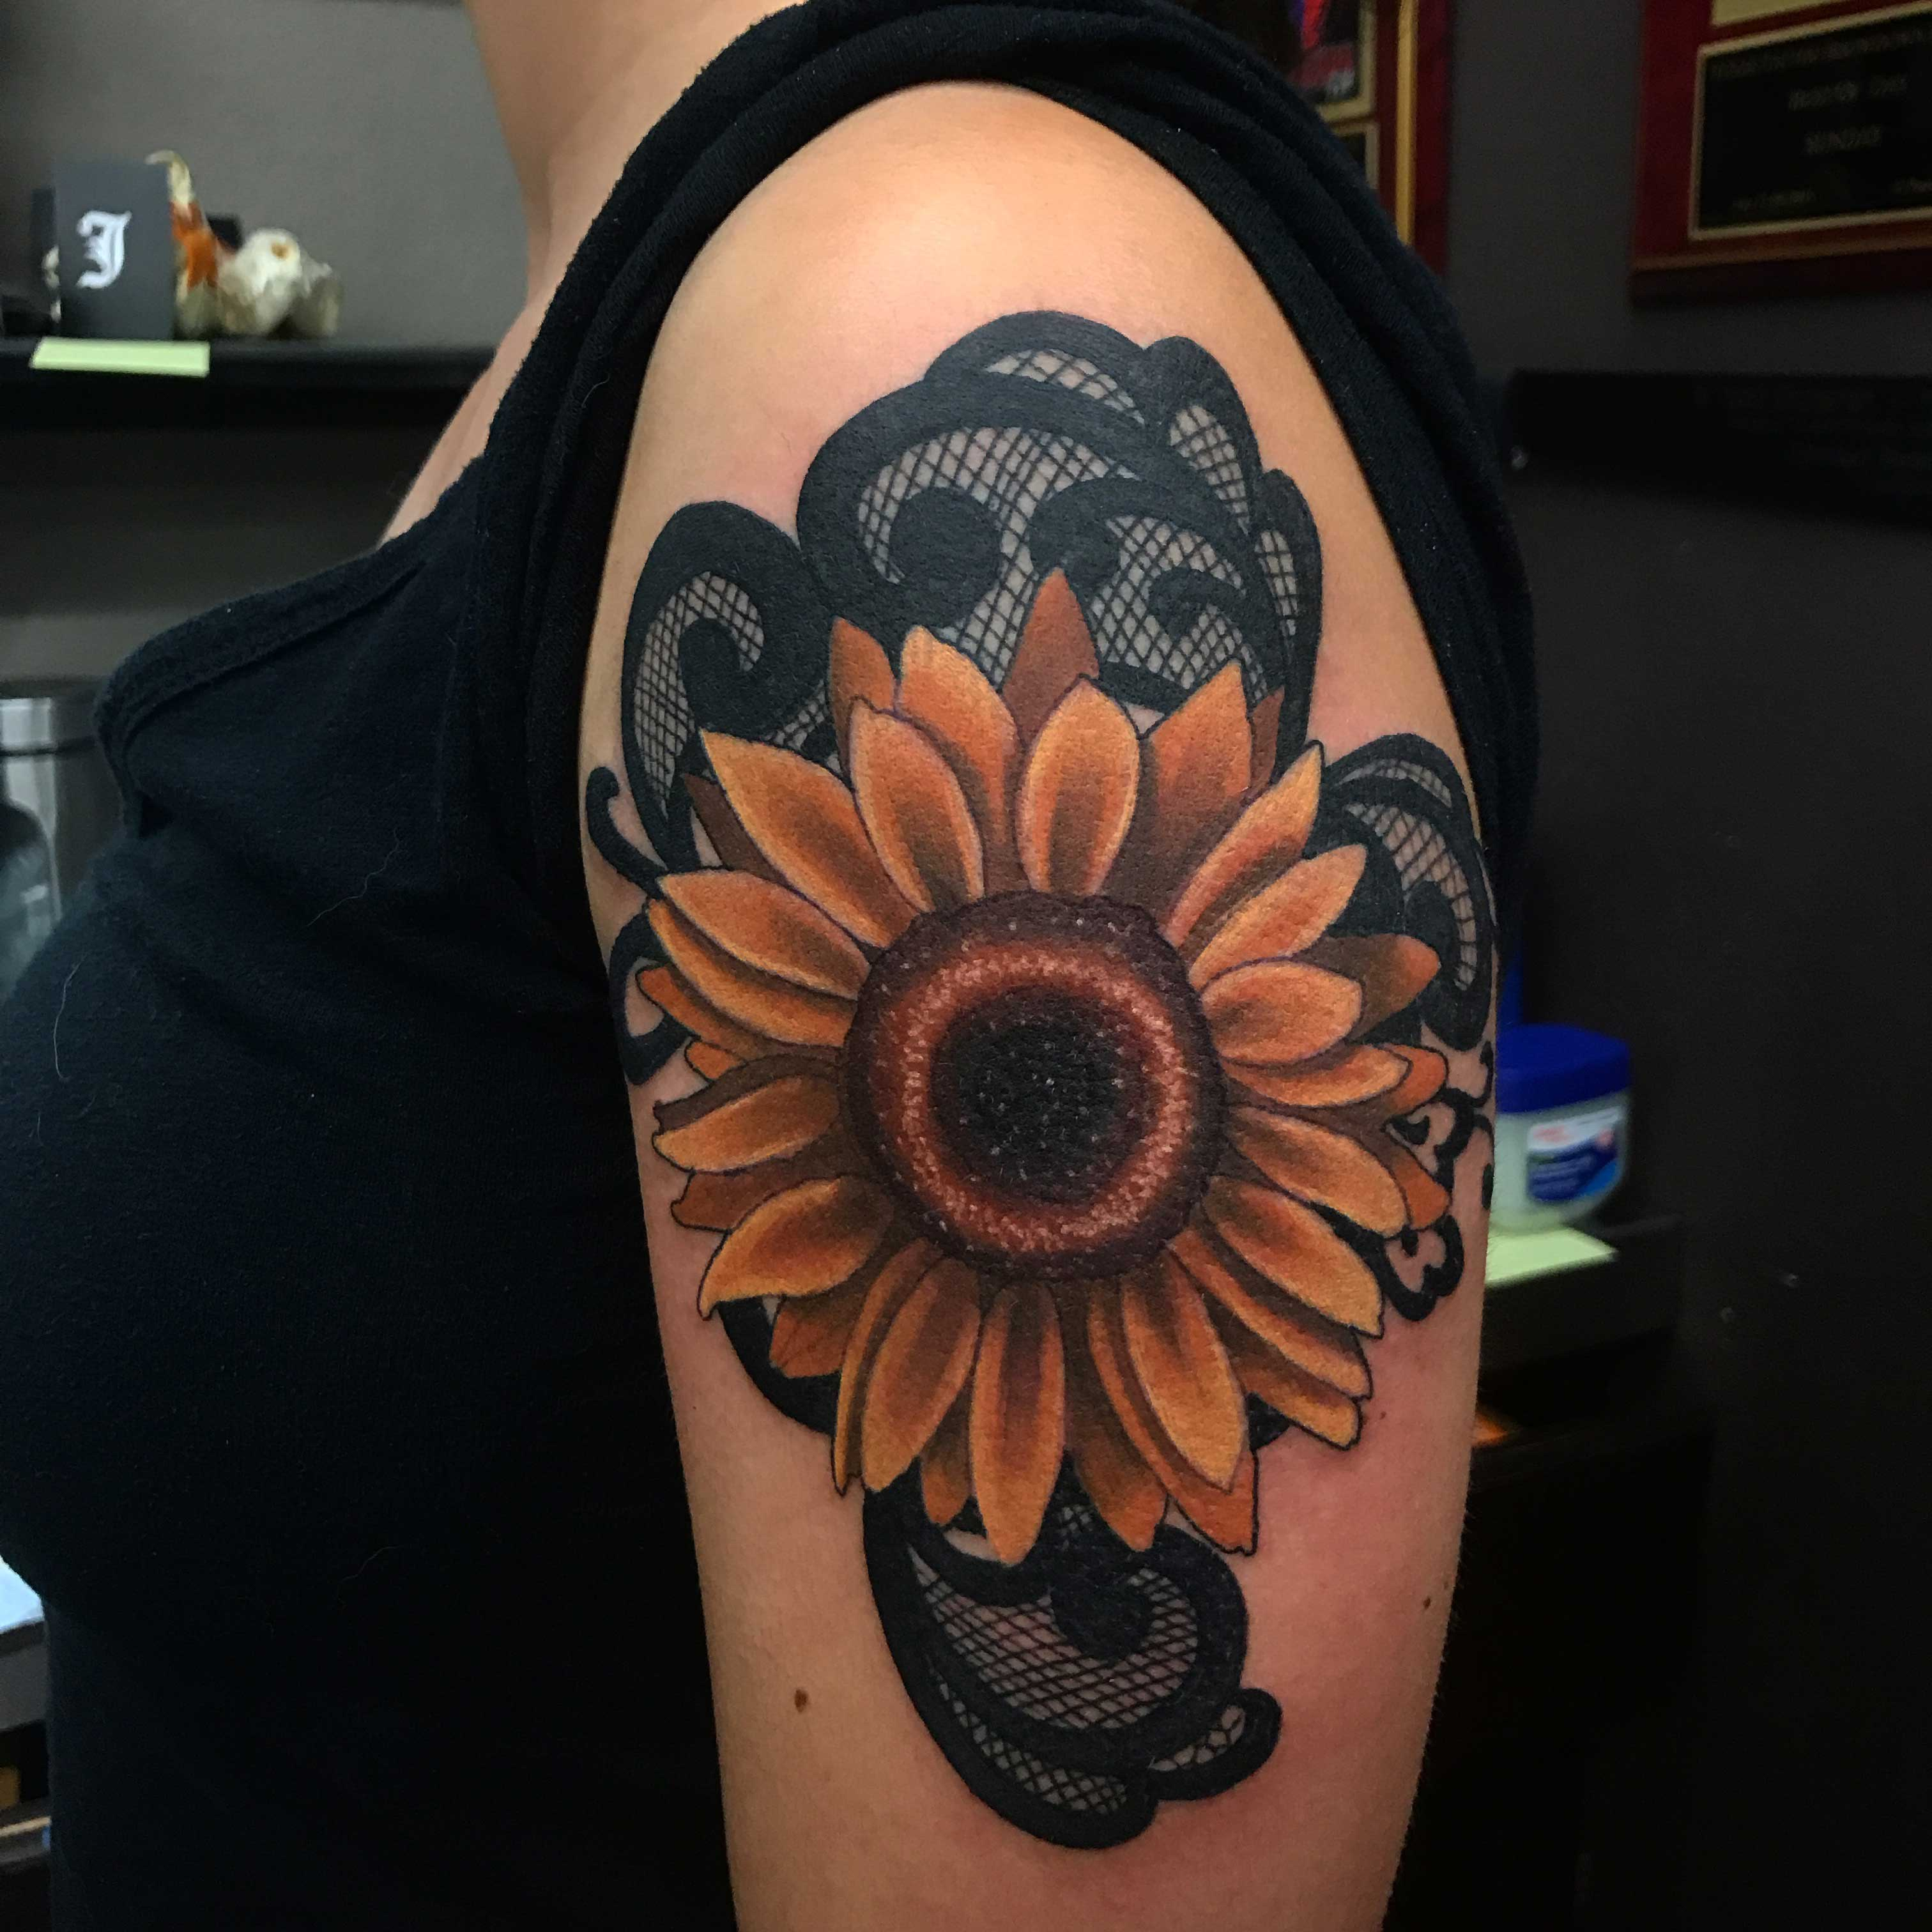 Sunflower+by+tattoo+artist+Brian+Stephens.+